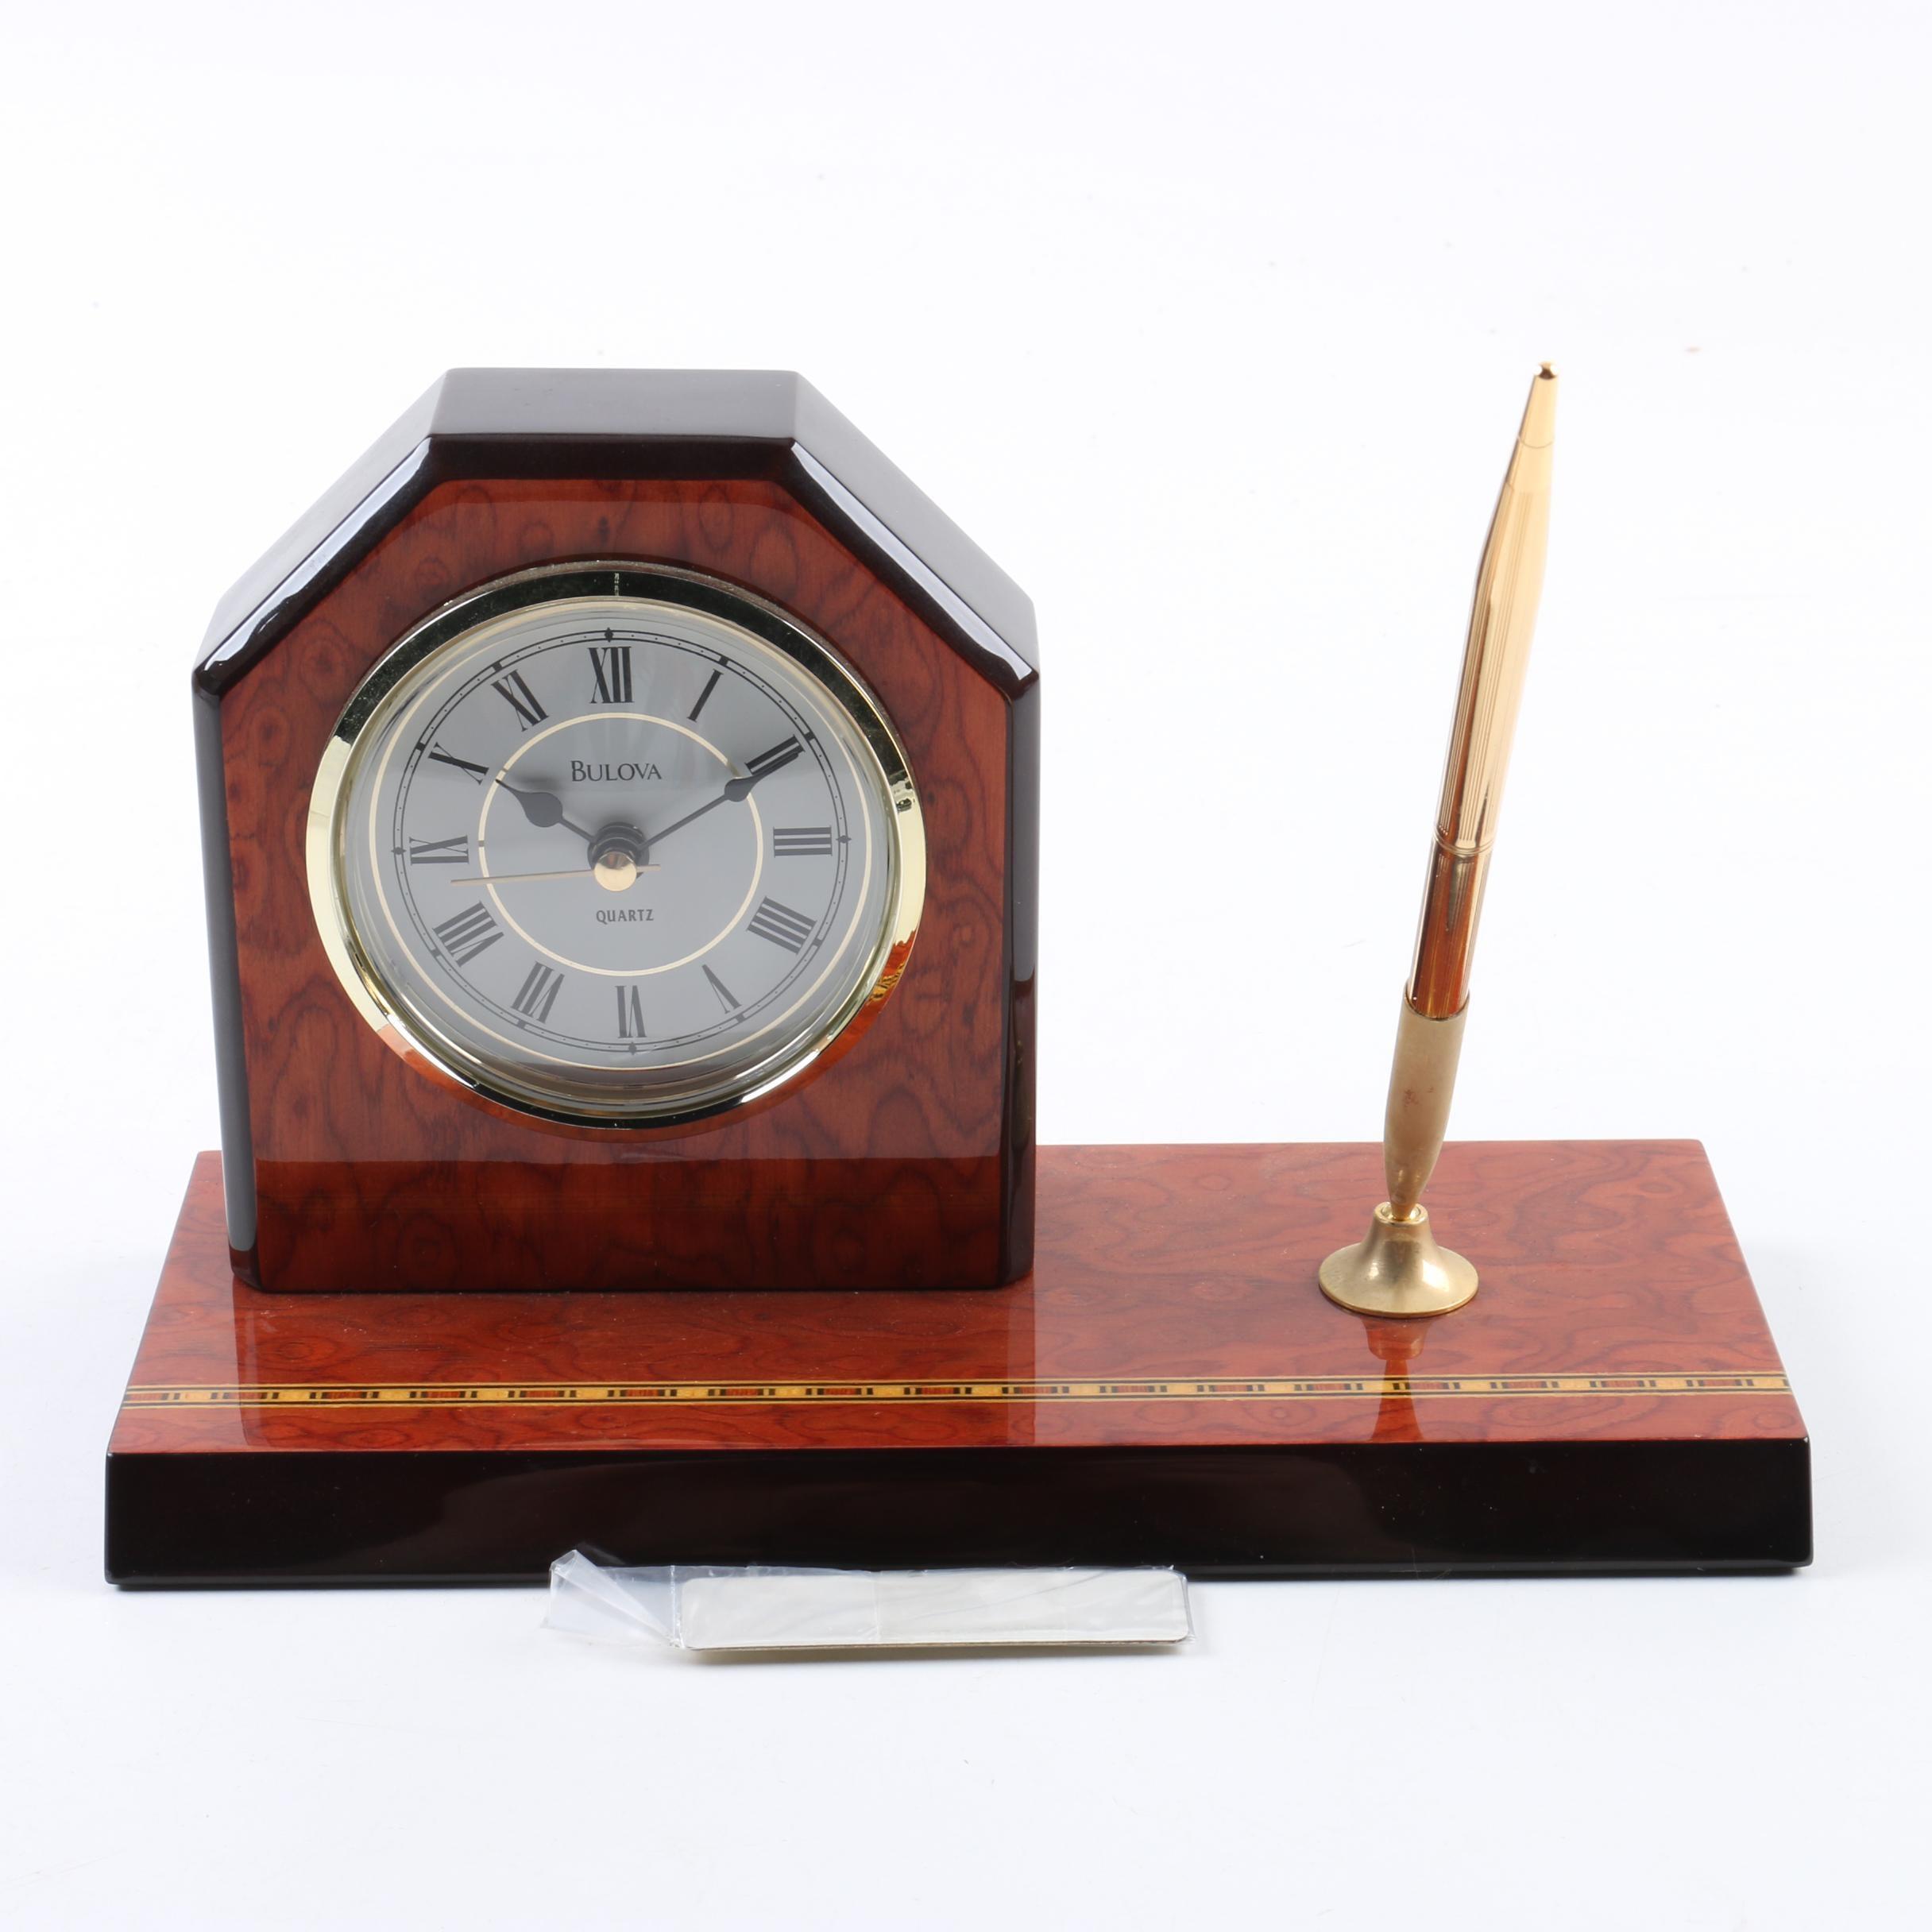 Bulova Quartz Clock and Pen Holder